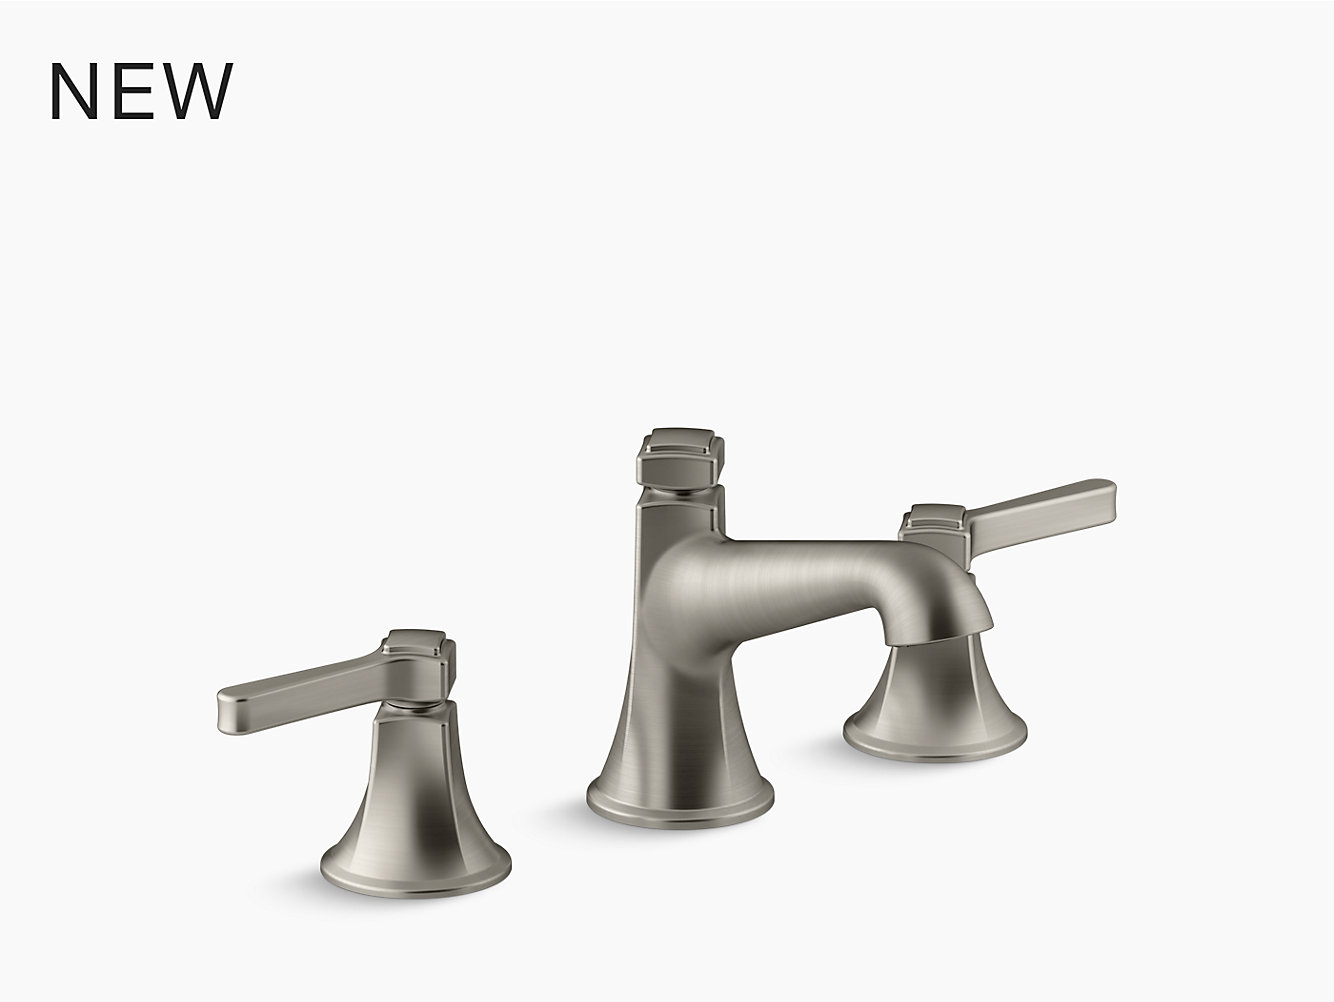 evoke single handle kitchen faucet k 6331 kohler view larger